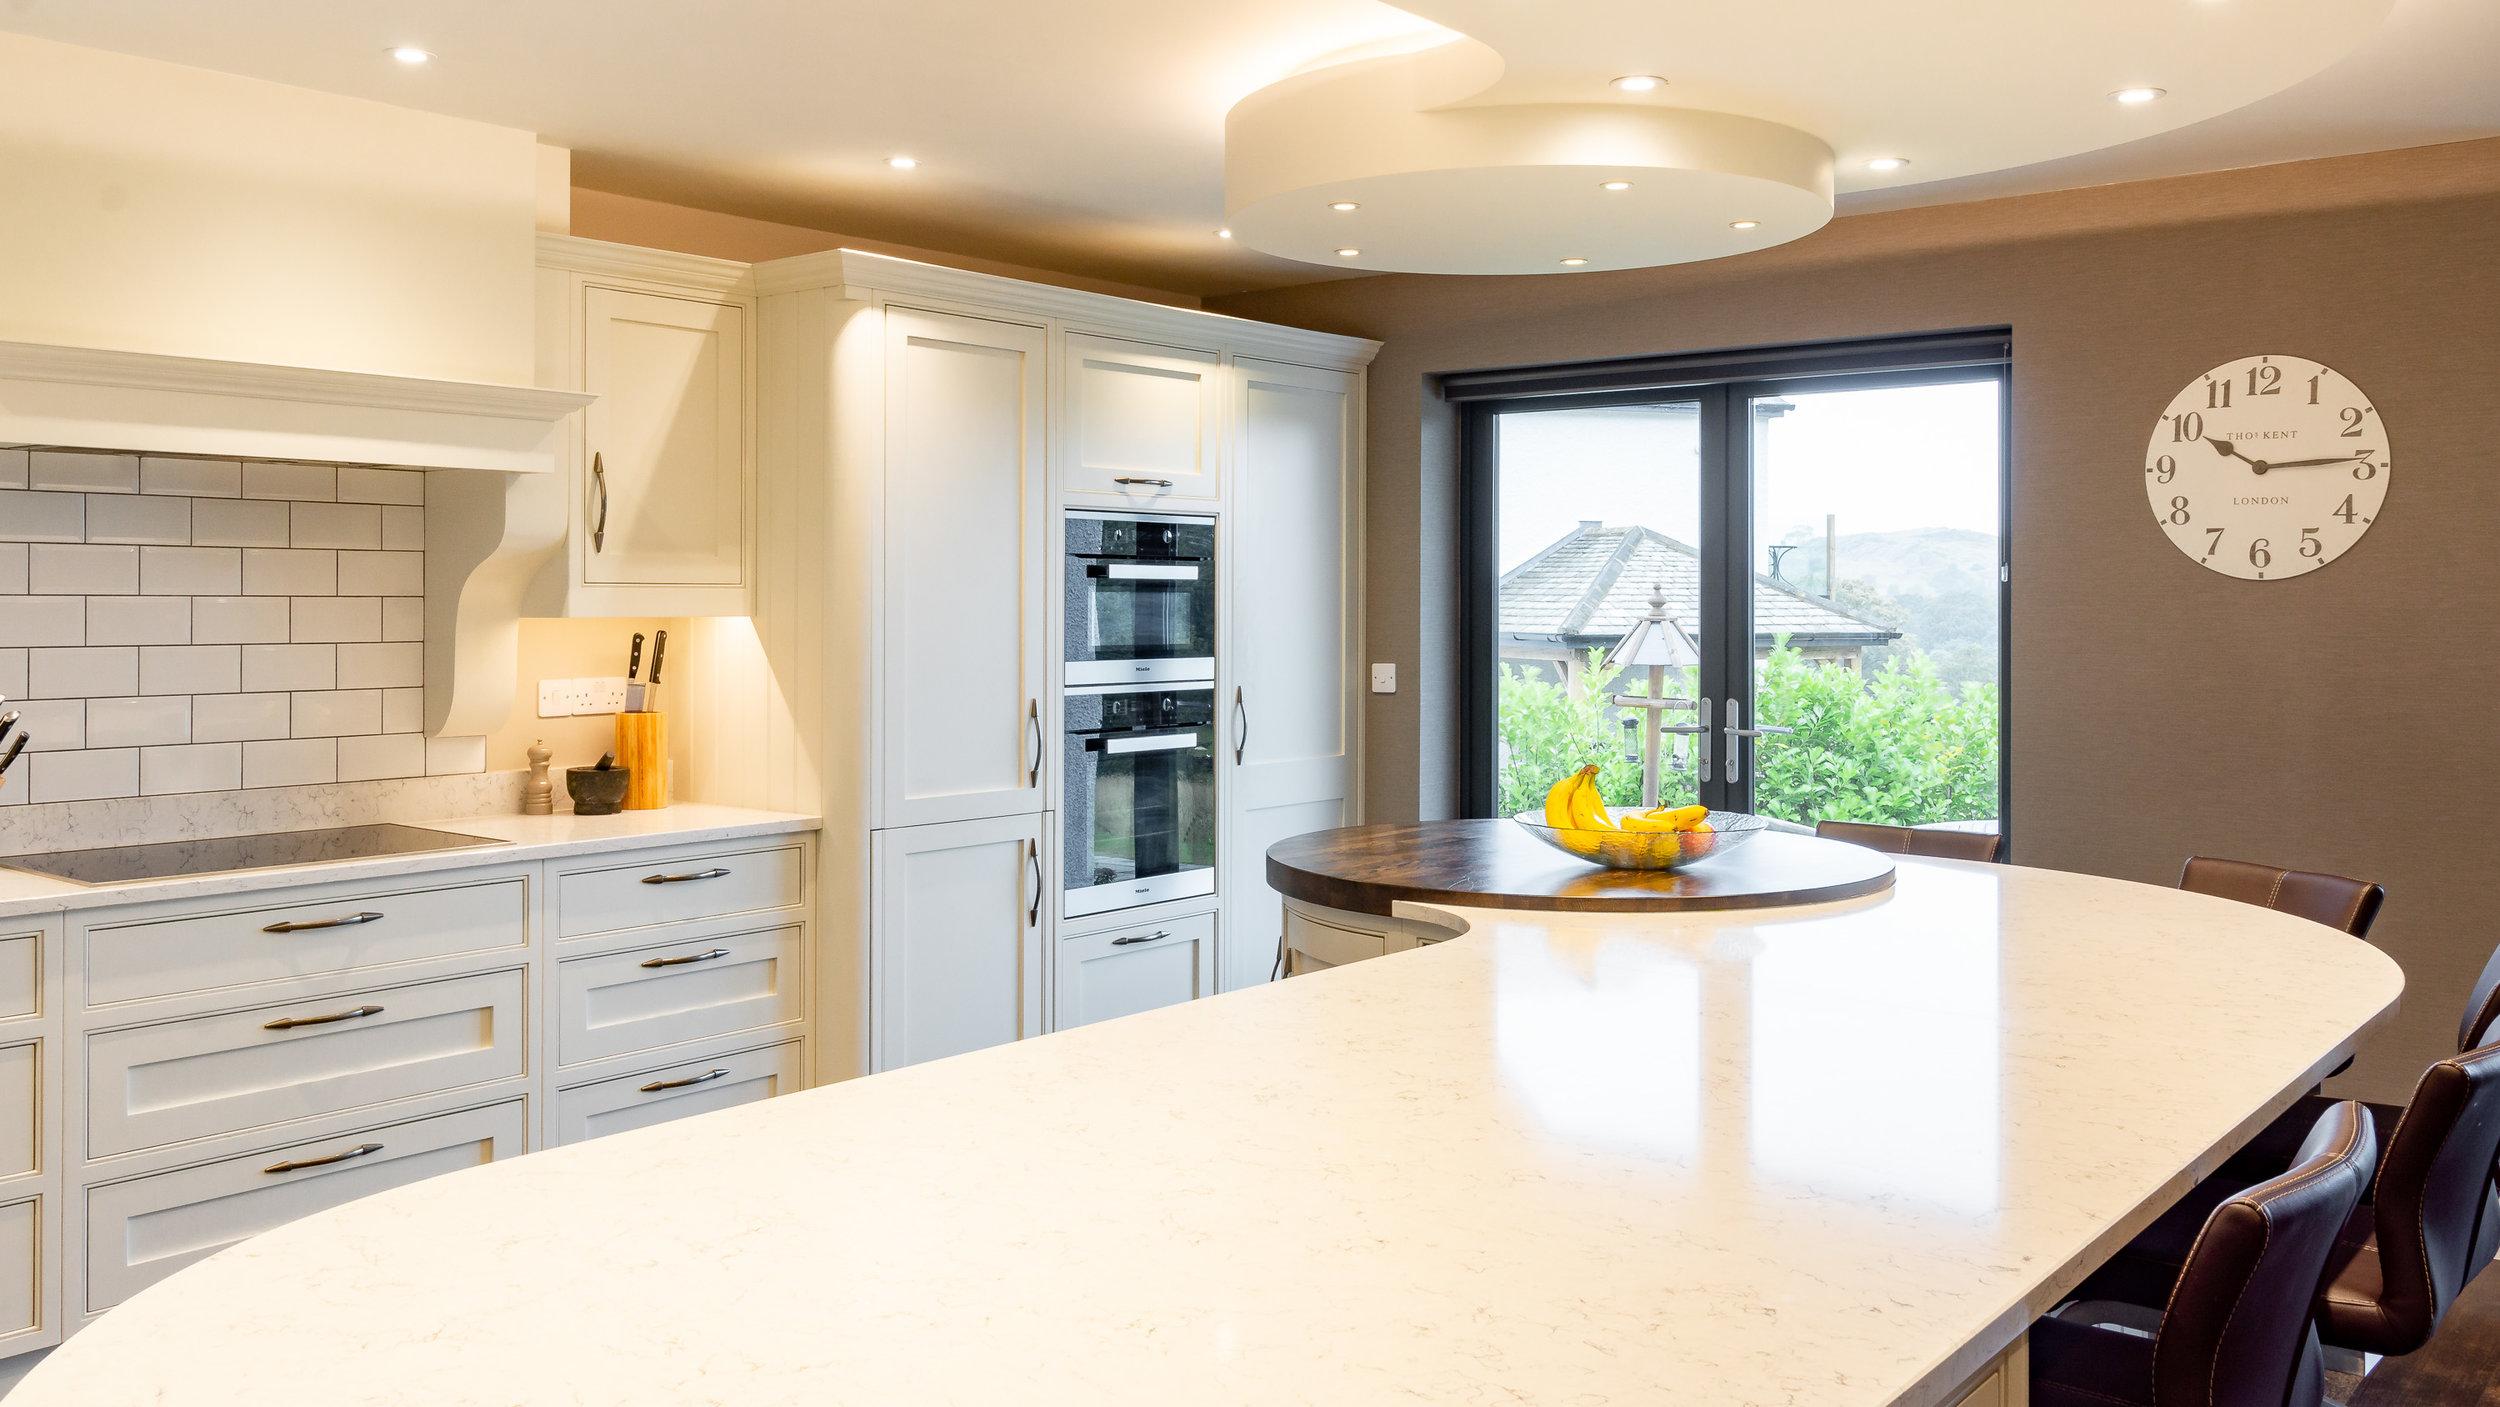 Webbs-Kitchens-Aimee-Curtin-00255.jpg